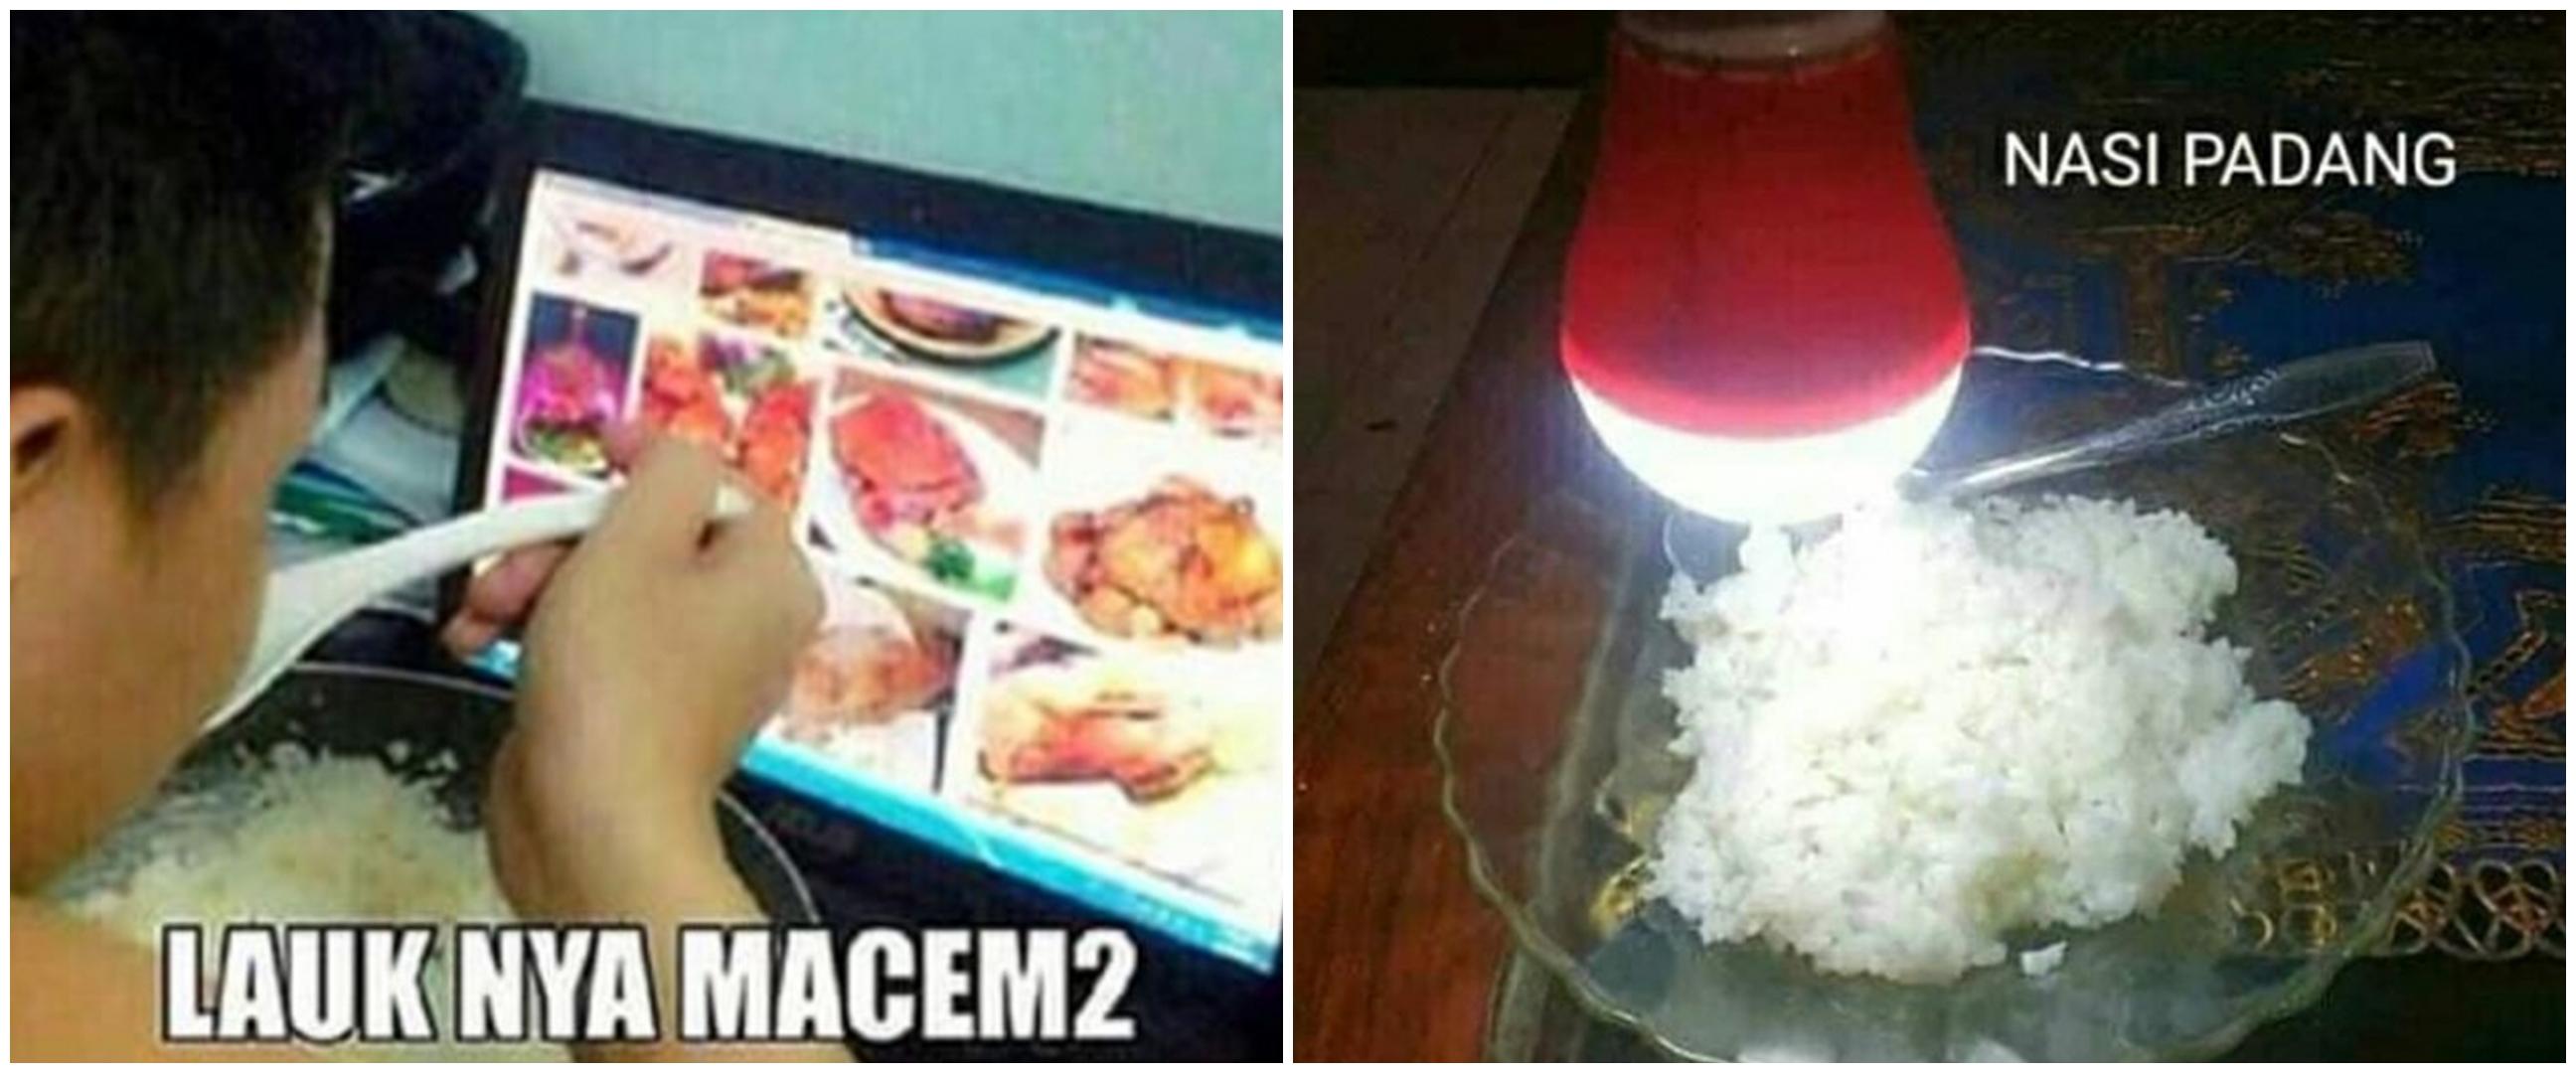 17 Meme lucu menu makanan mahasiswa akhir bulan, bikin ngelus dada